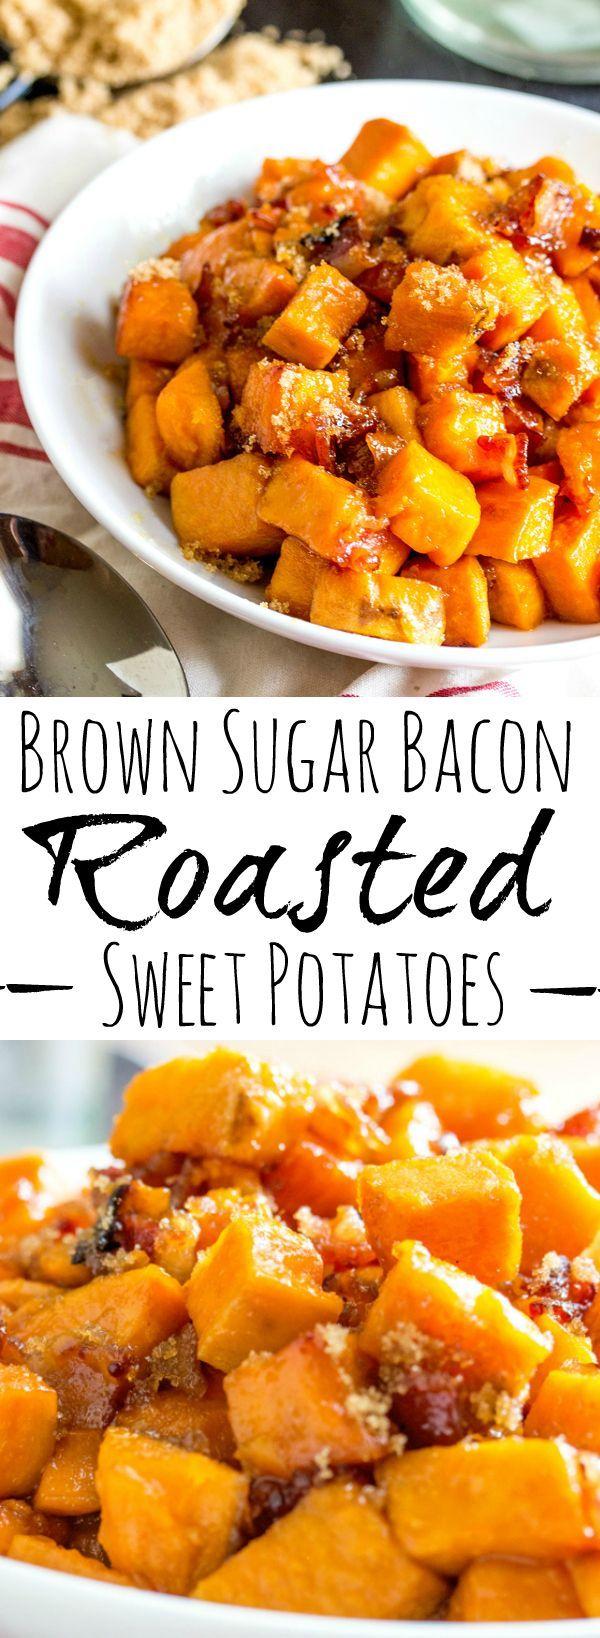 Brown Sugar Bacon Roasted Sweet Potatoes - great Thanksgiving side dish.